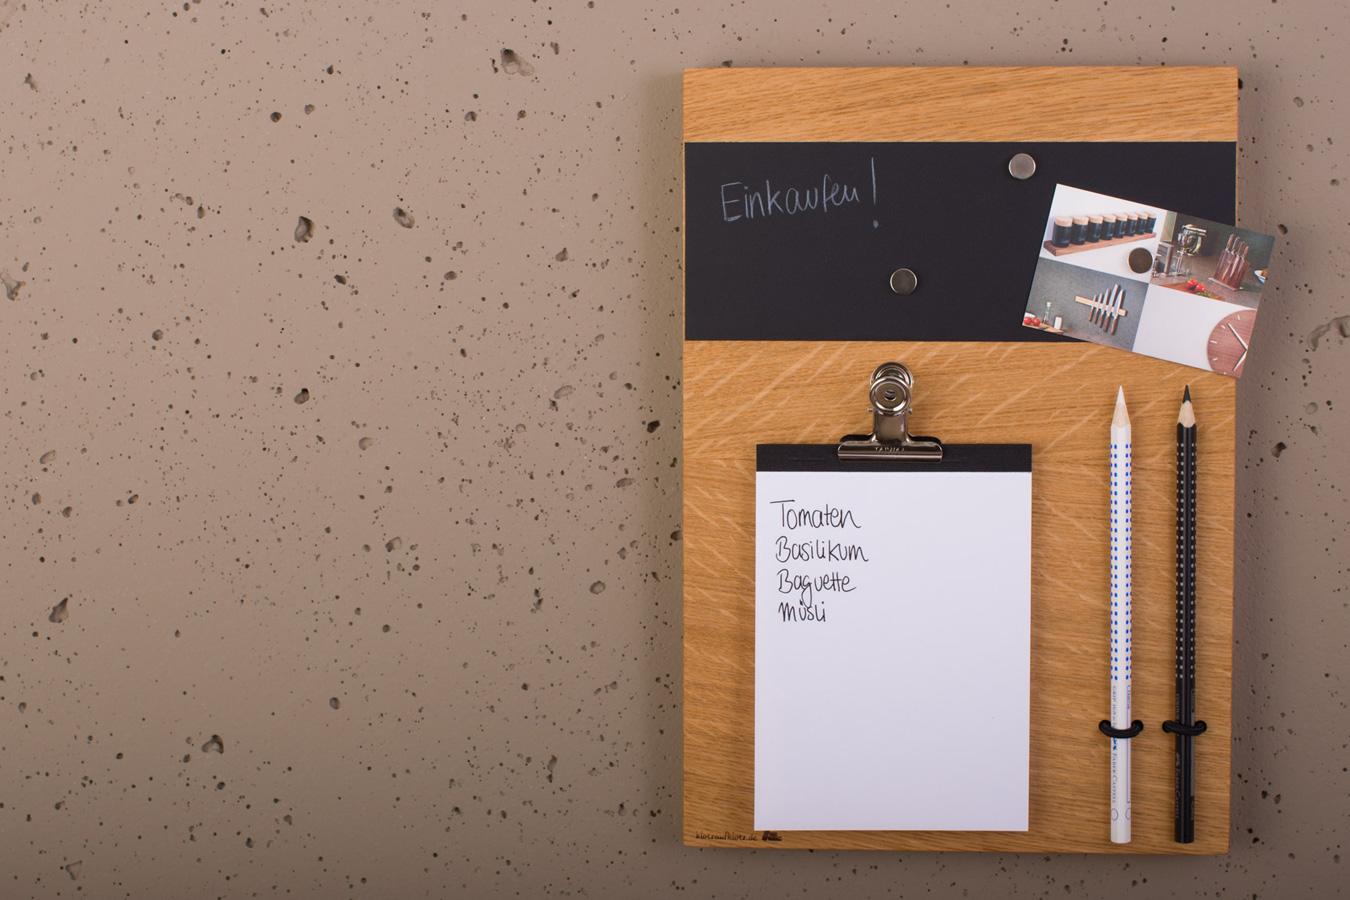 pinnwand klotzaufklotz exzellente holzprodukte. Black Bedroom Furniture Sets. Home Design Ideas